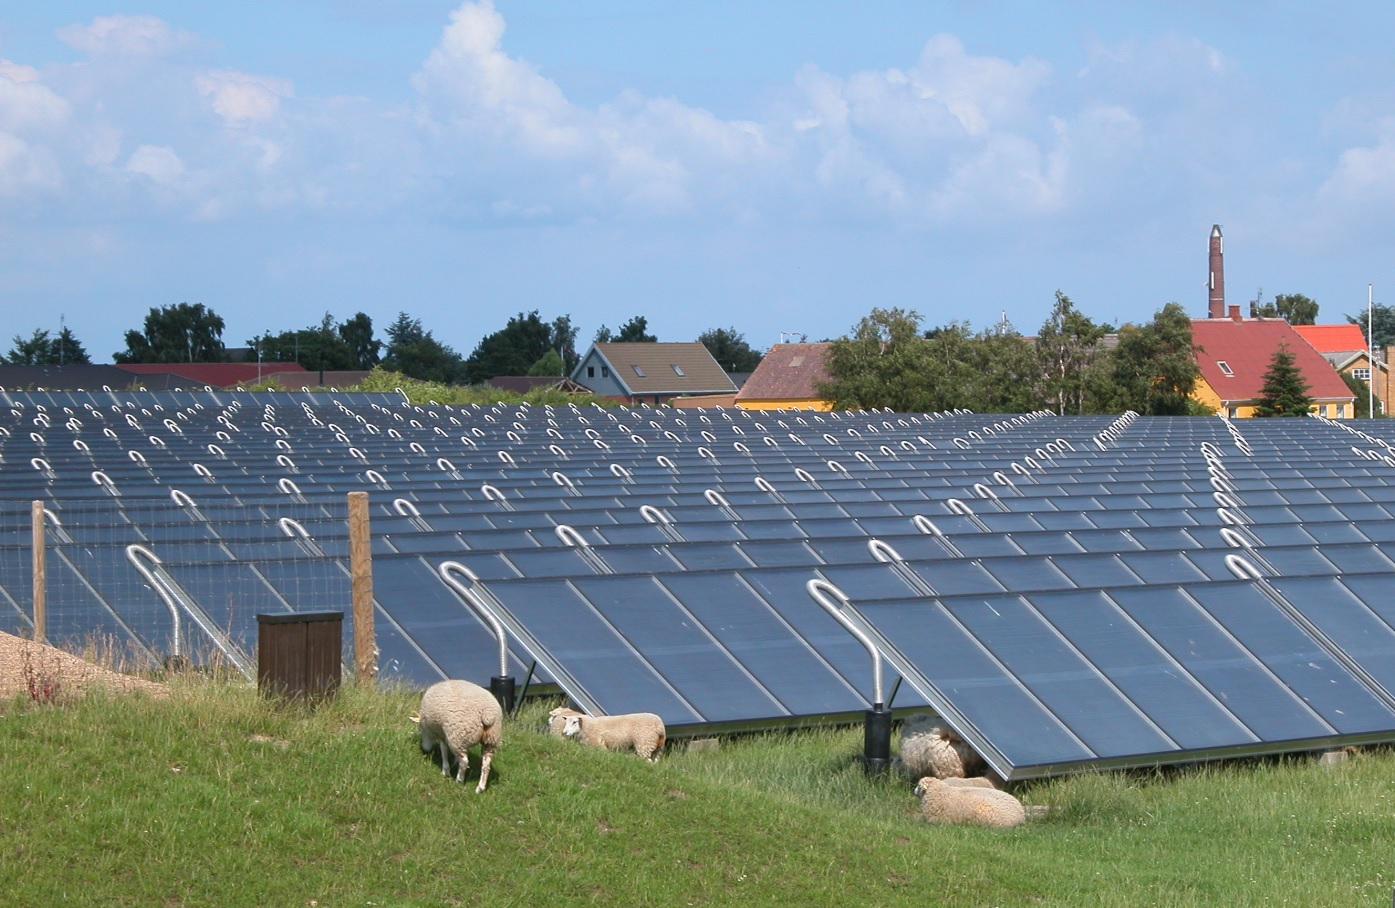 RPT-Solar company says UK needs new policies to meet 2050 carbon target